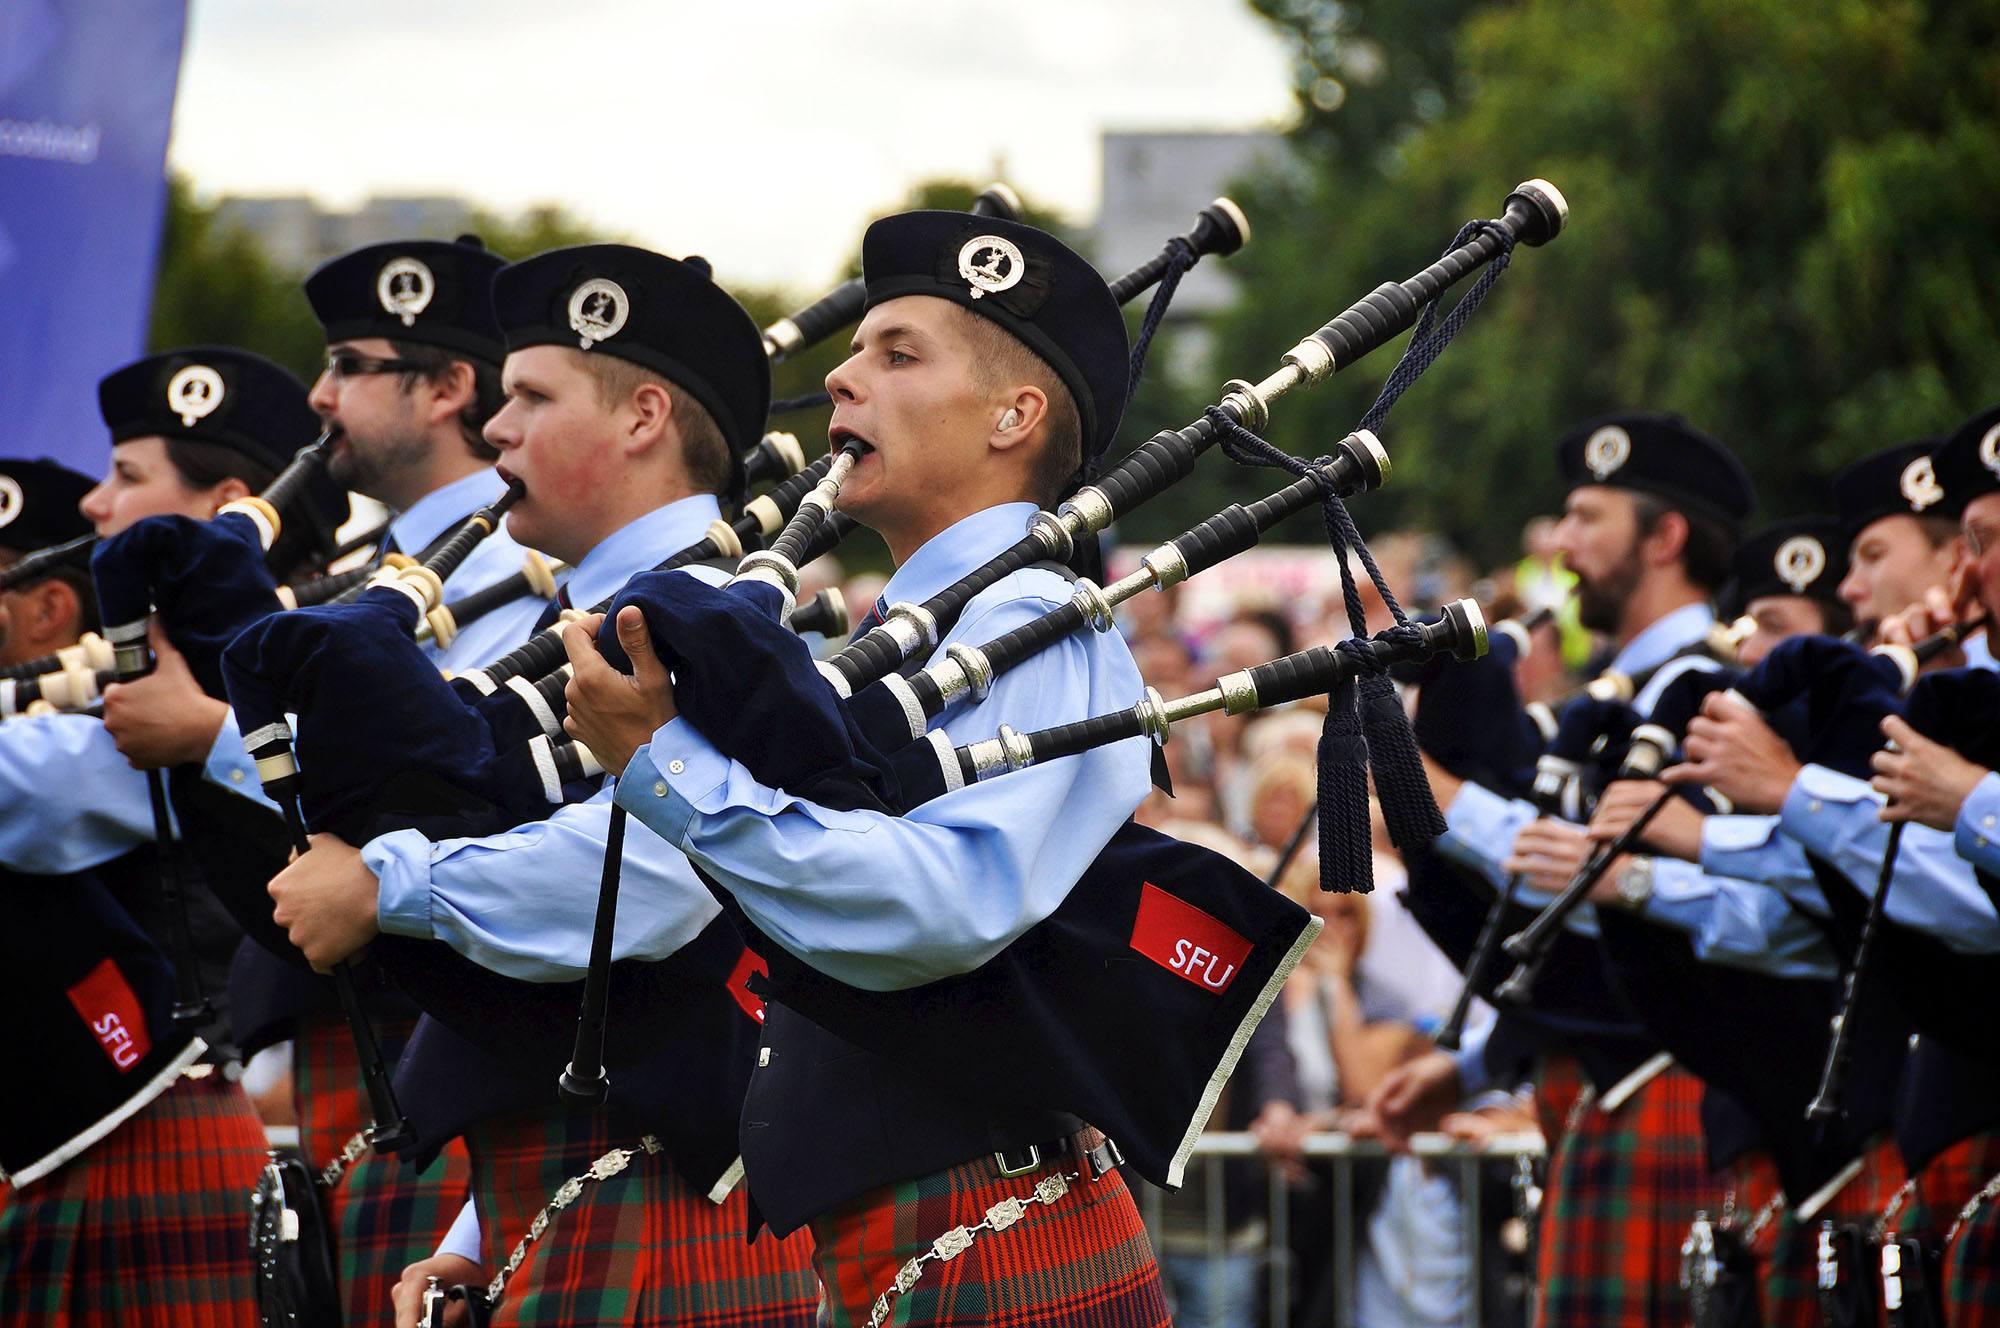 SFU Pipe Band (SFU/Flickr)